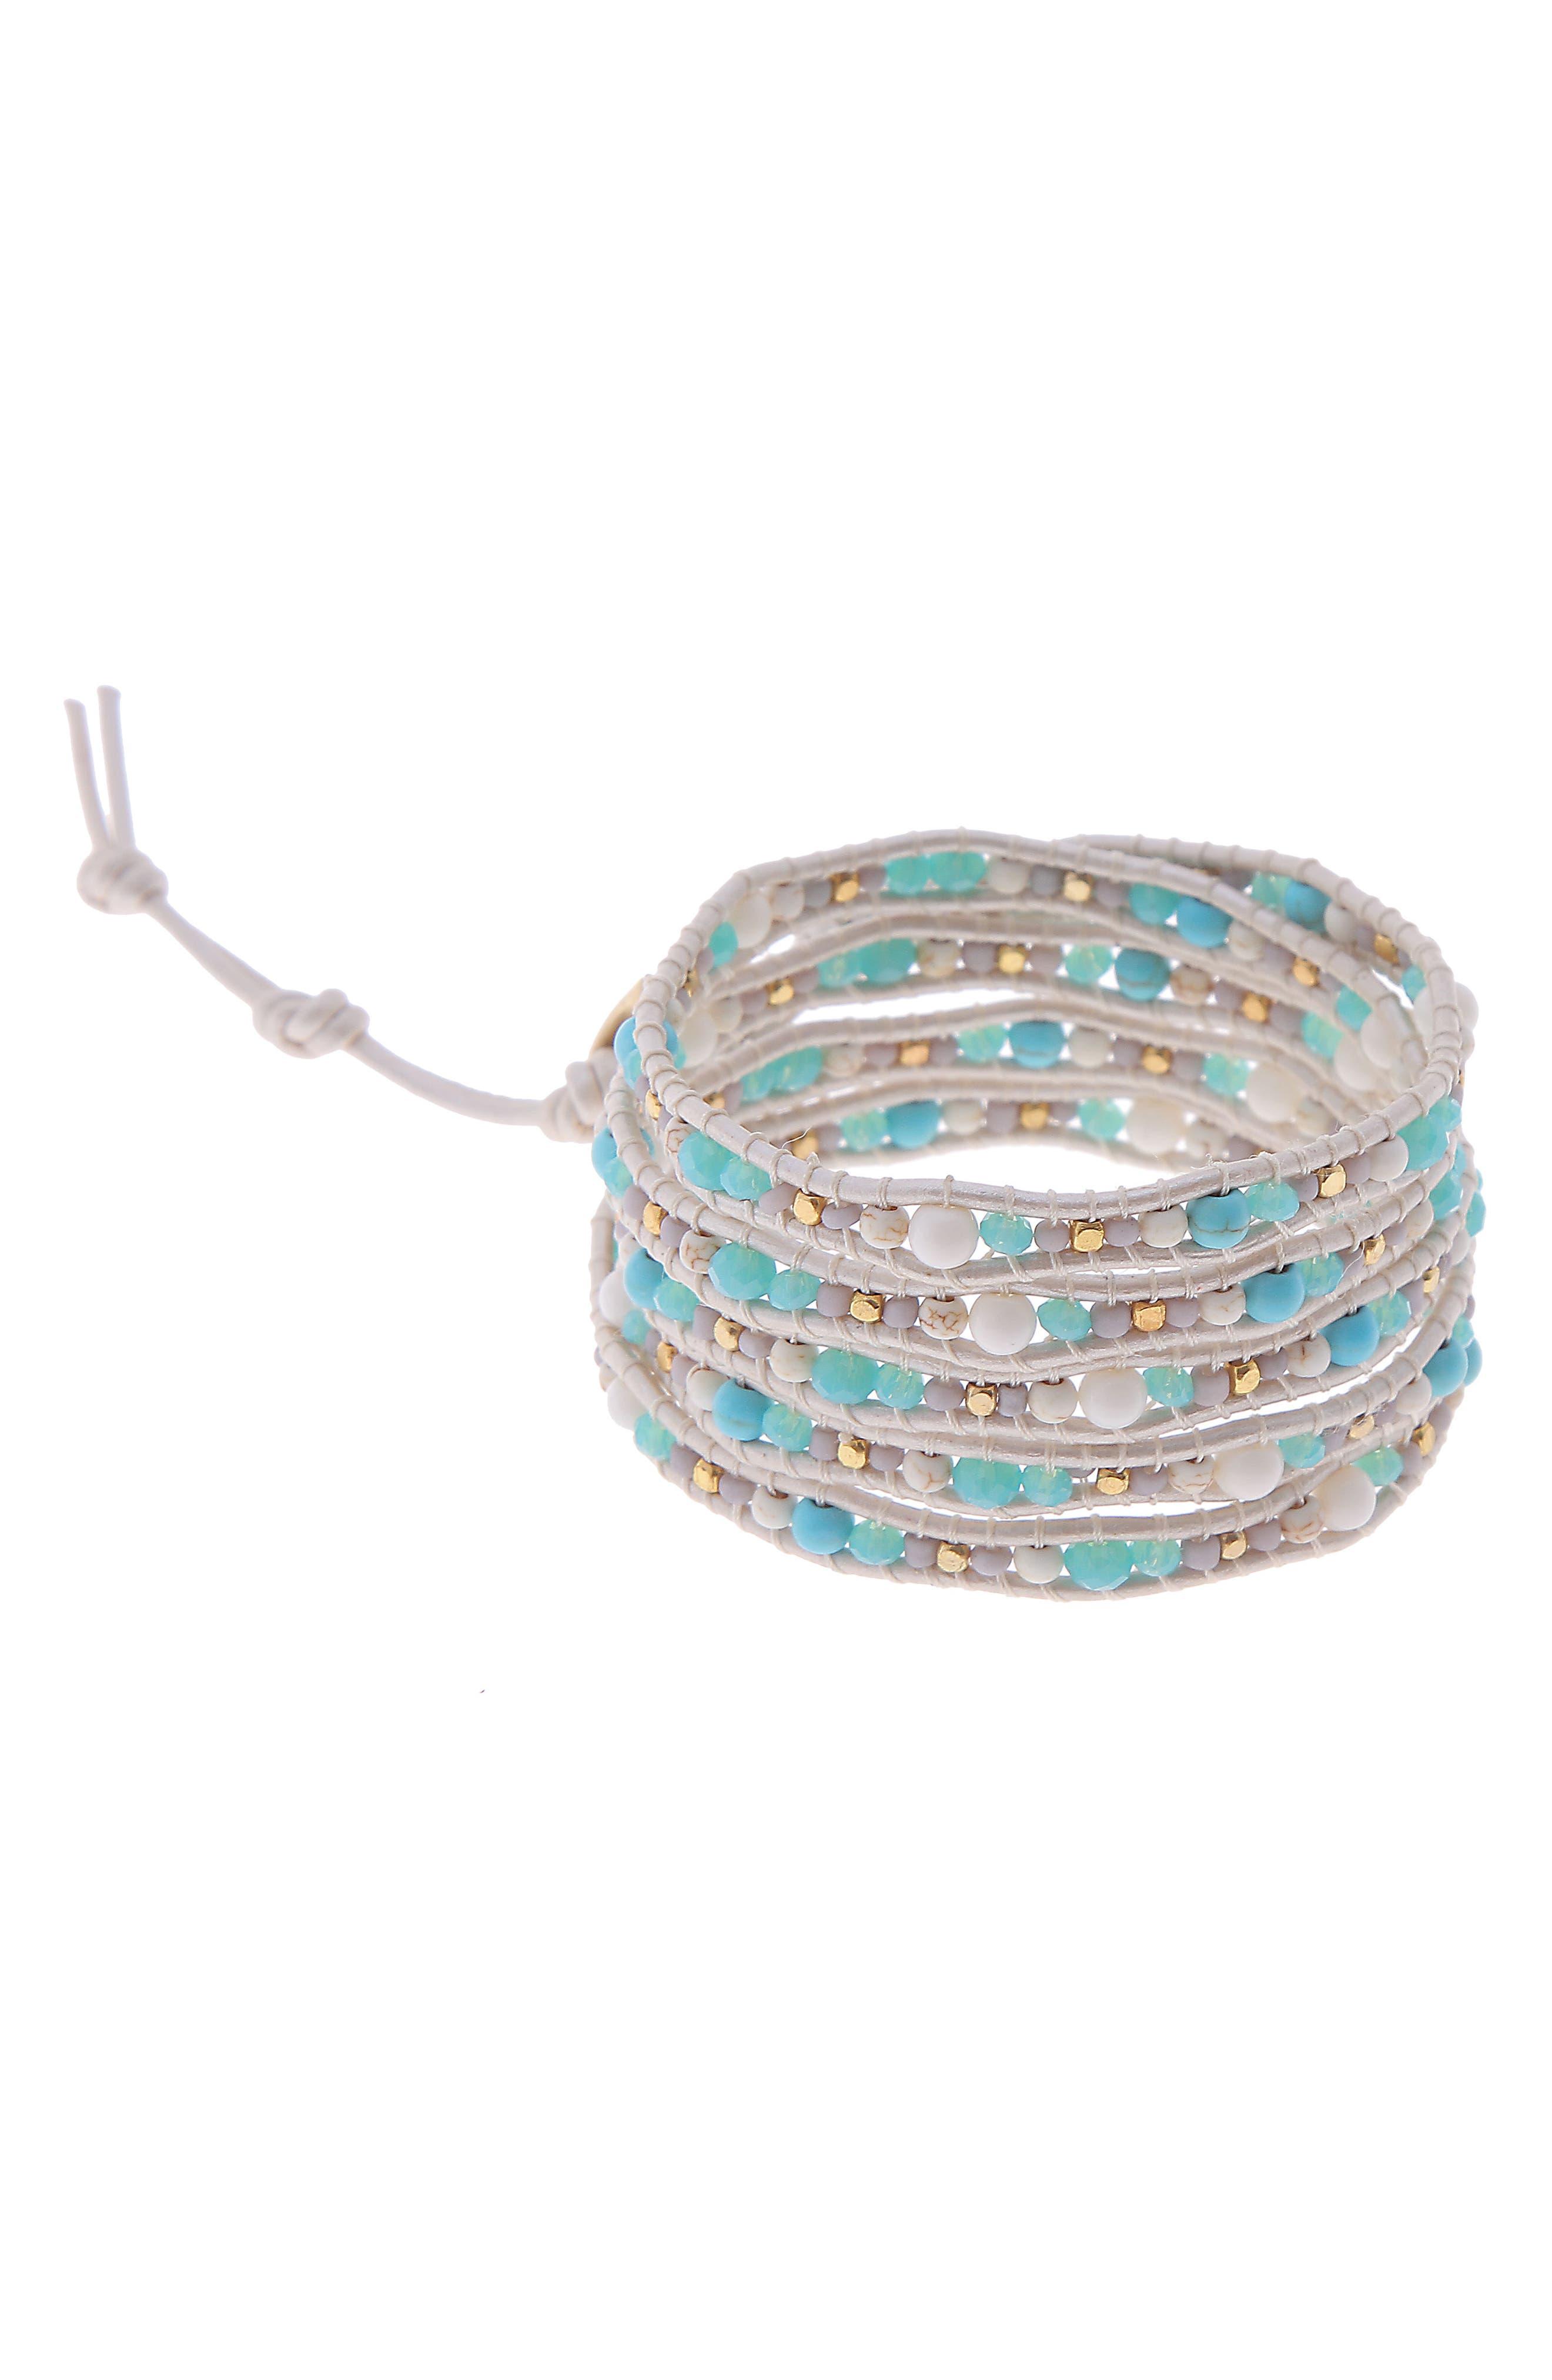 Stone & Metal Wrap Bracelet,                         Main,                         color, Turquoise